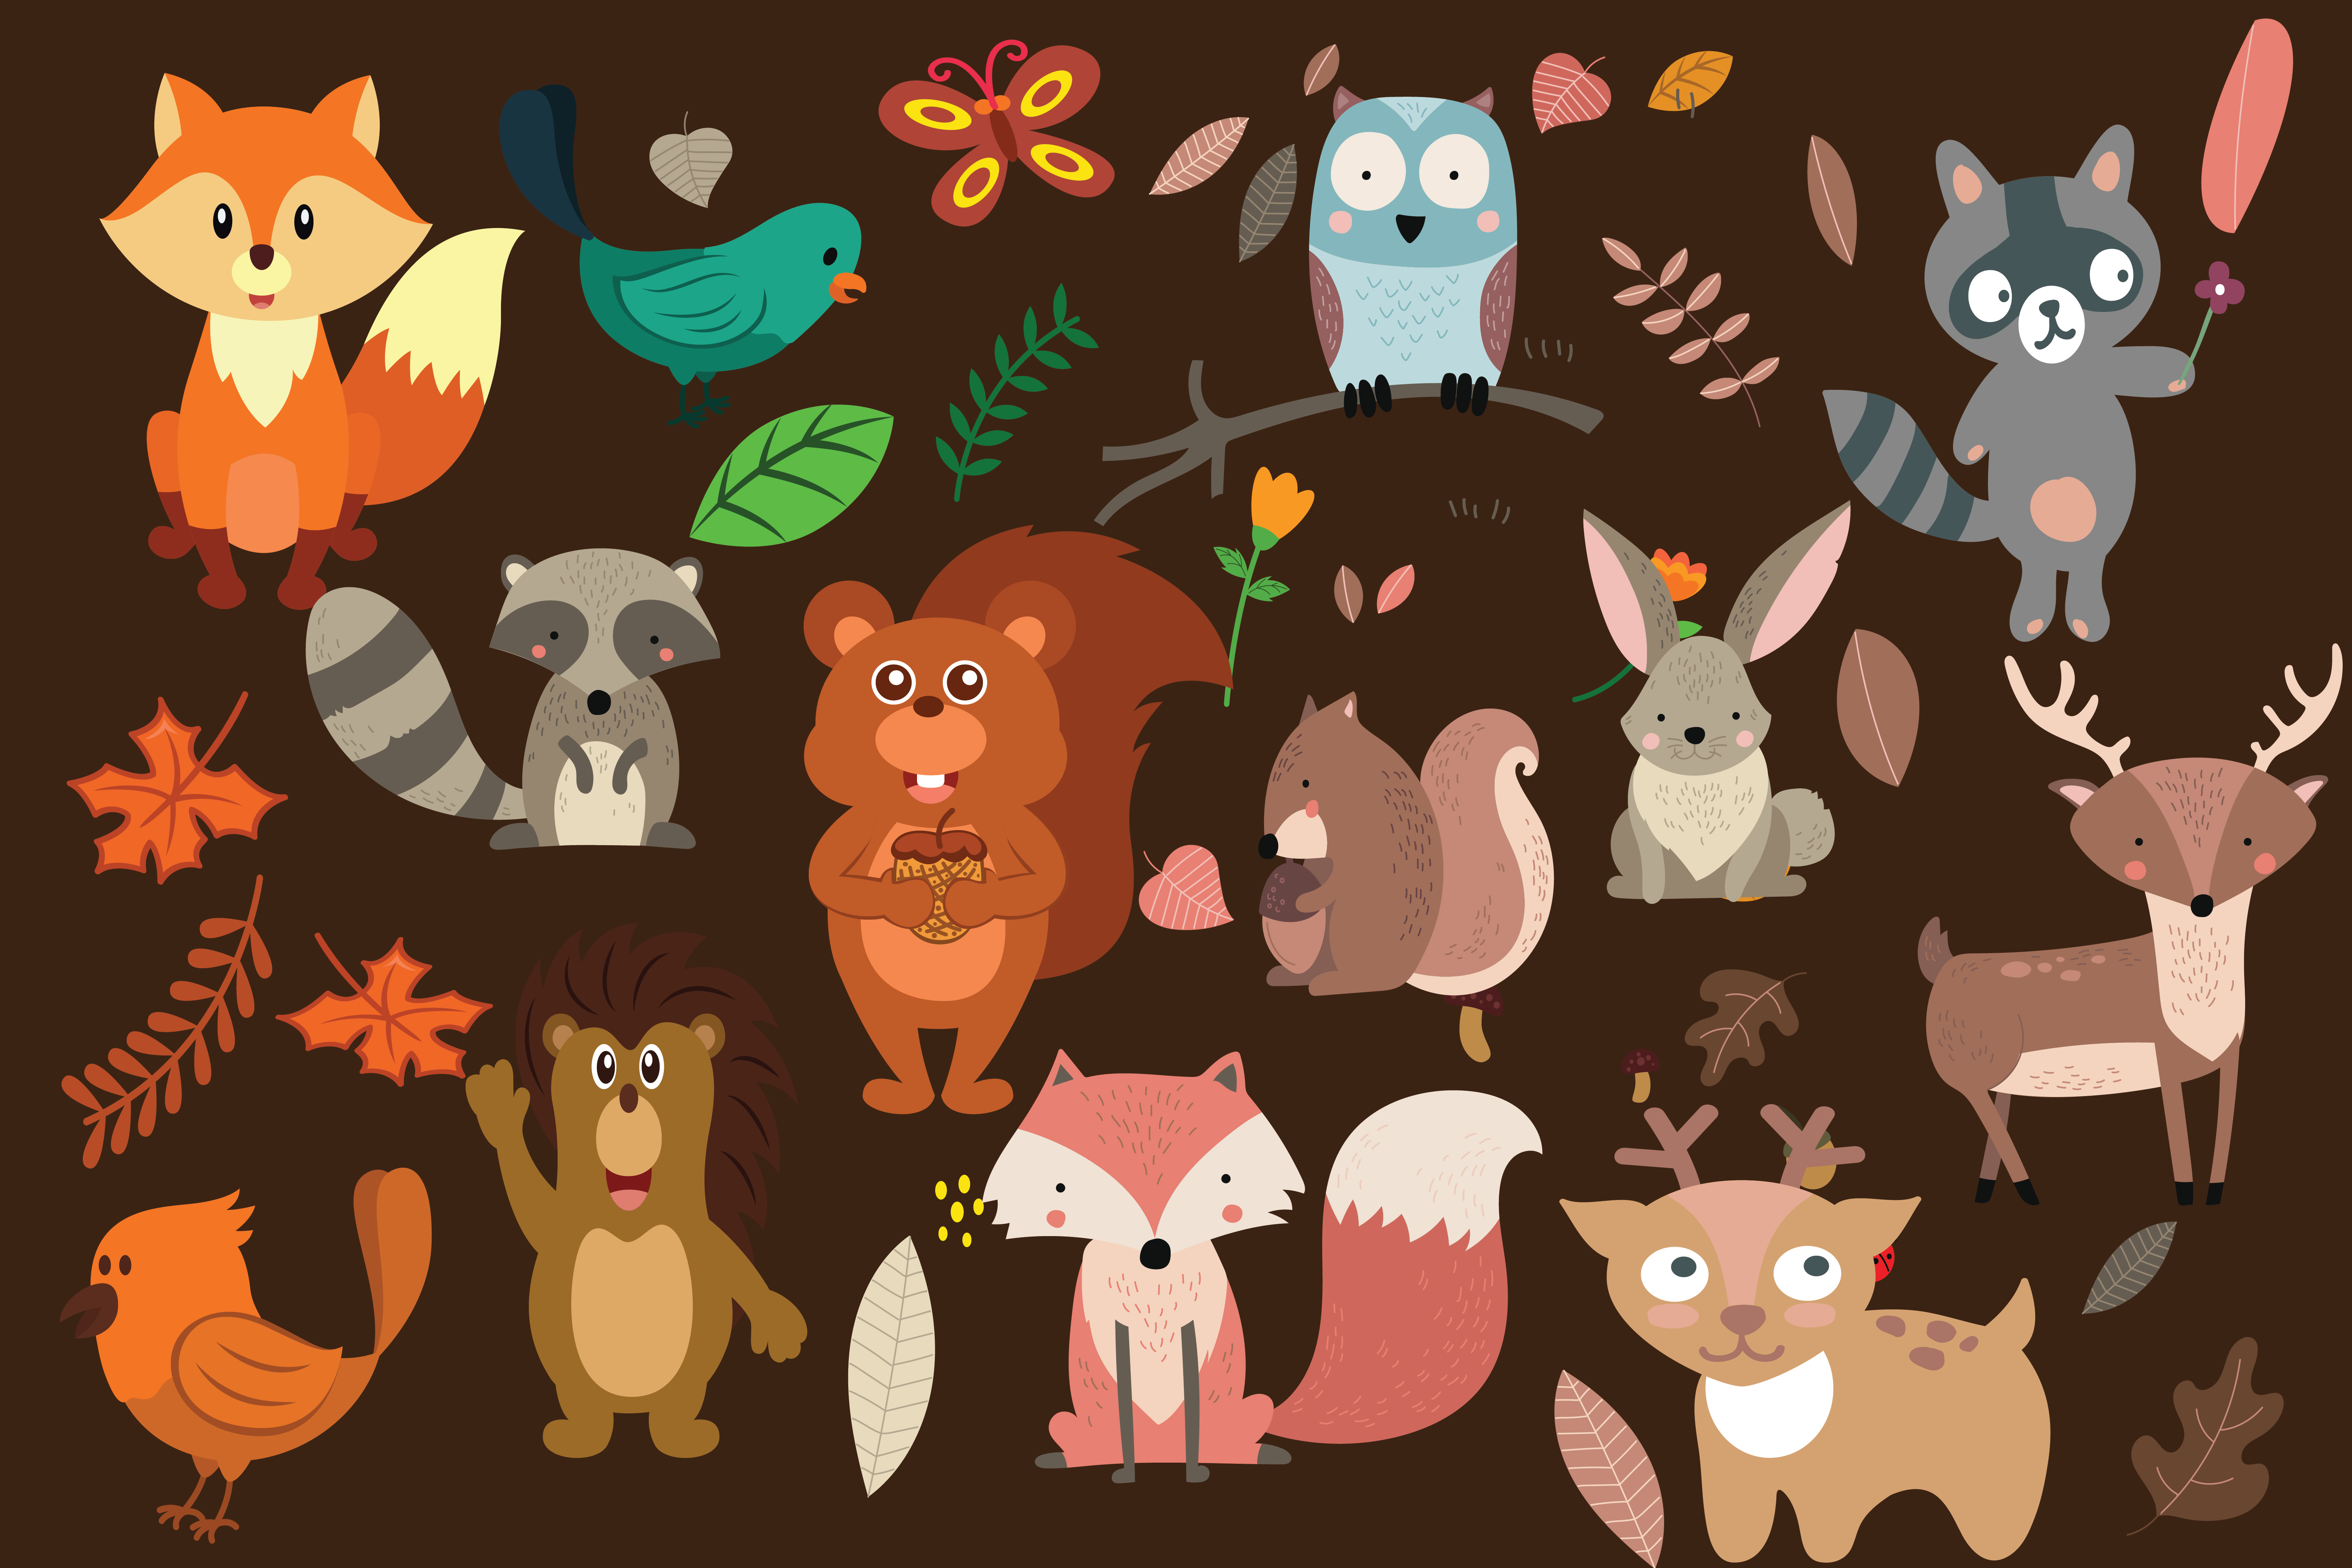 wood land animals,woodland,animals,forest animals,forest,animals,animal,fox,owl,bear example image 2